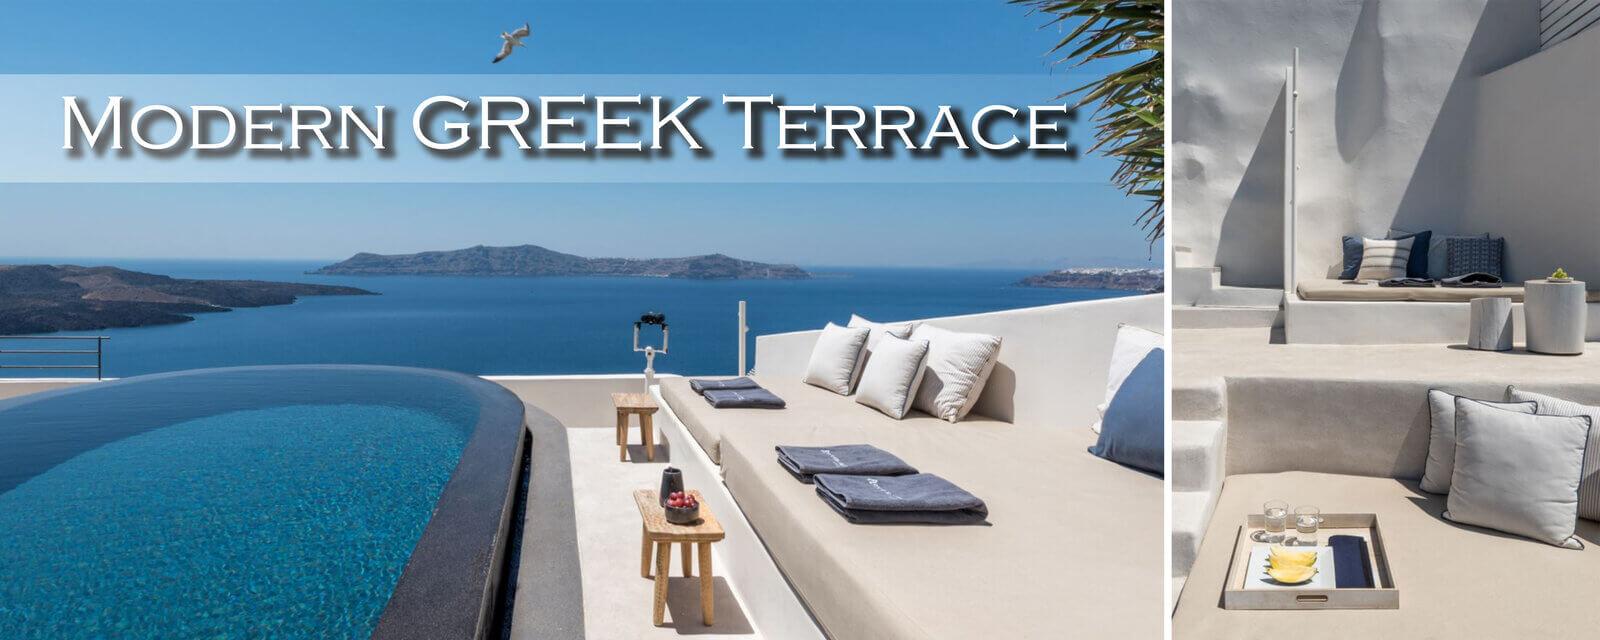 Modern Greek Terrace